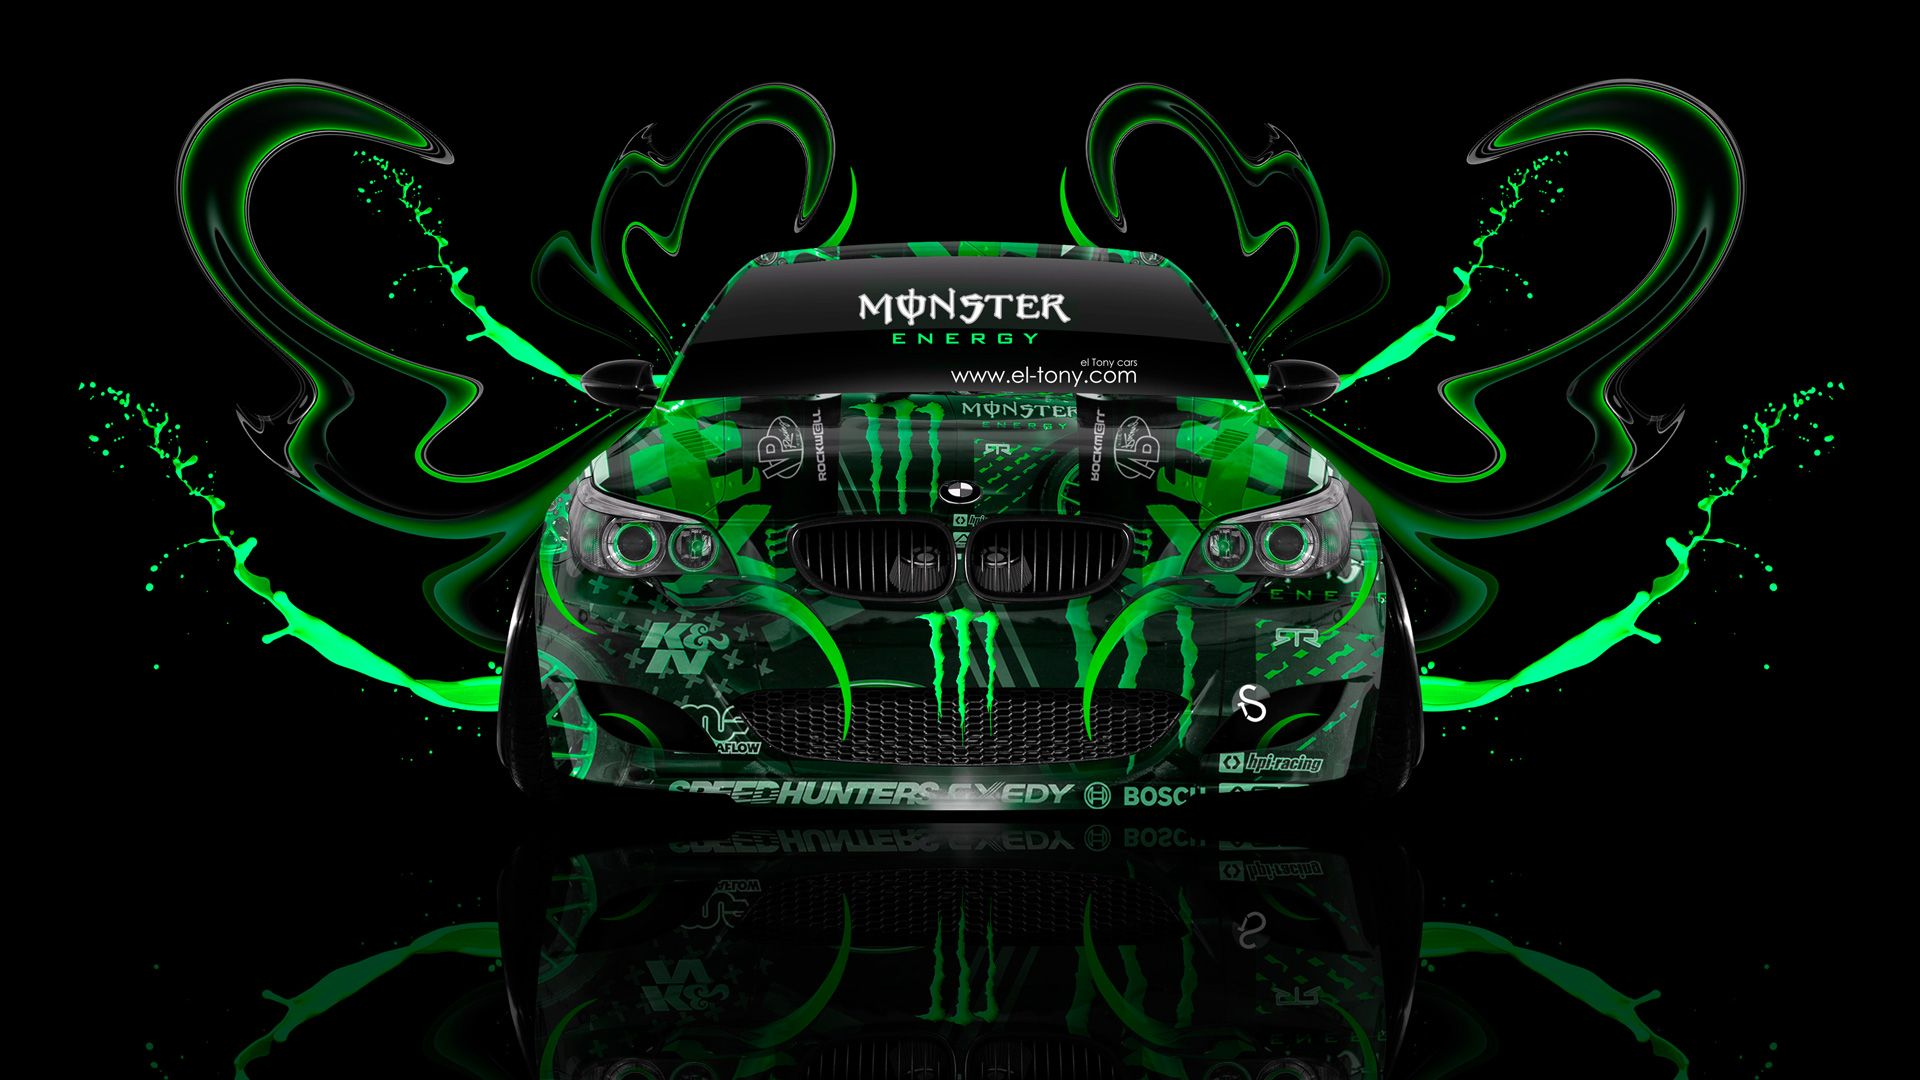 Monster Energy BMW M5 Front Plastic Acid Car